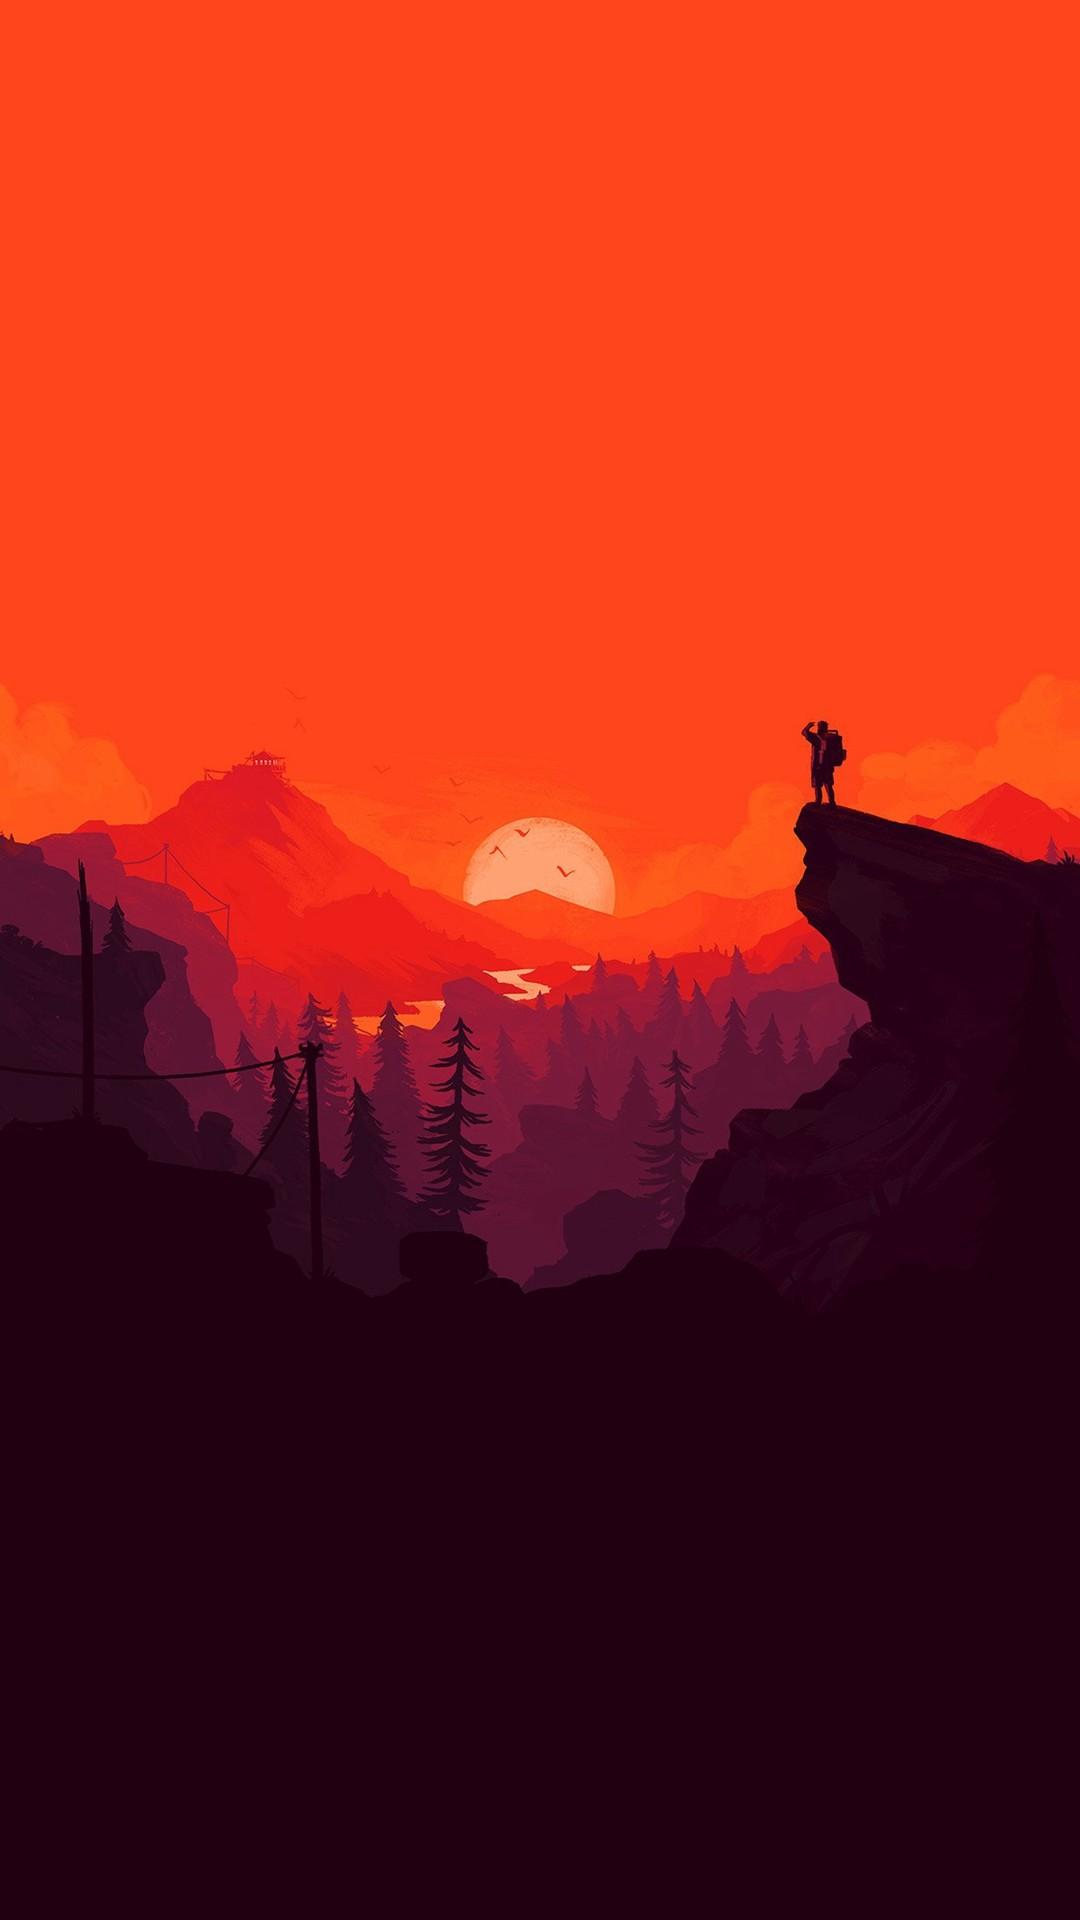 Nature Sunset Simple Minimal Illustration Art Red #iPhone #6 #wallpaper